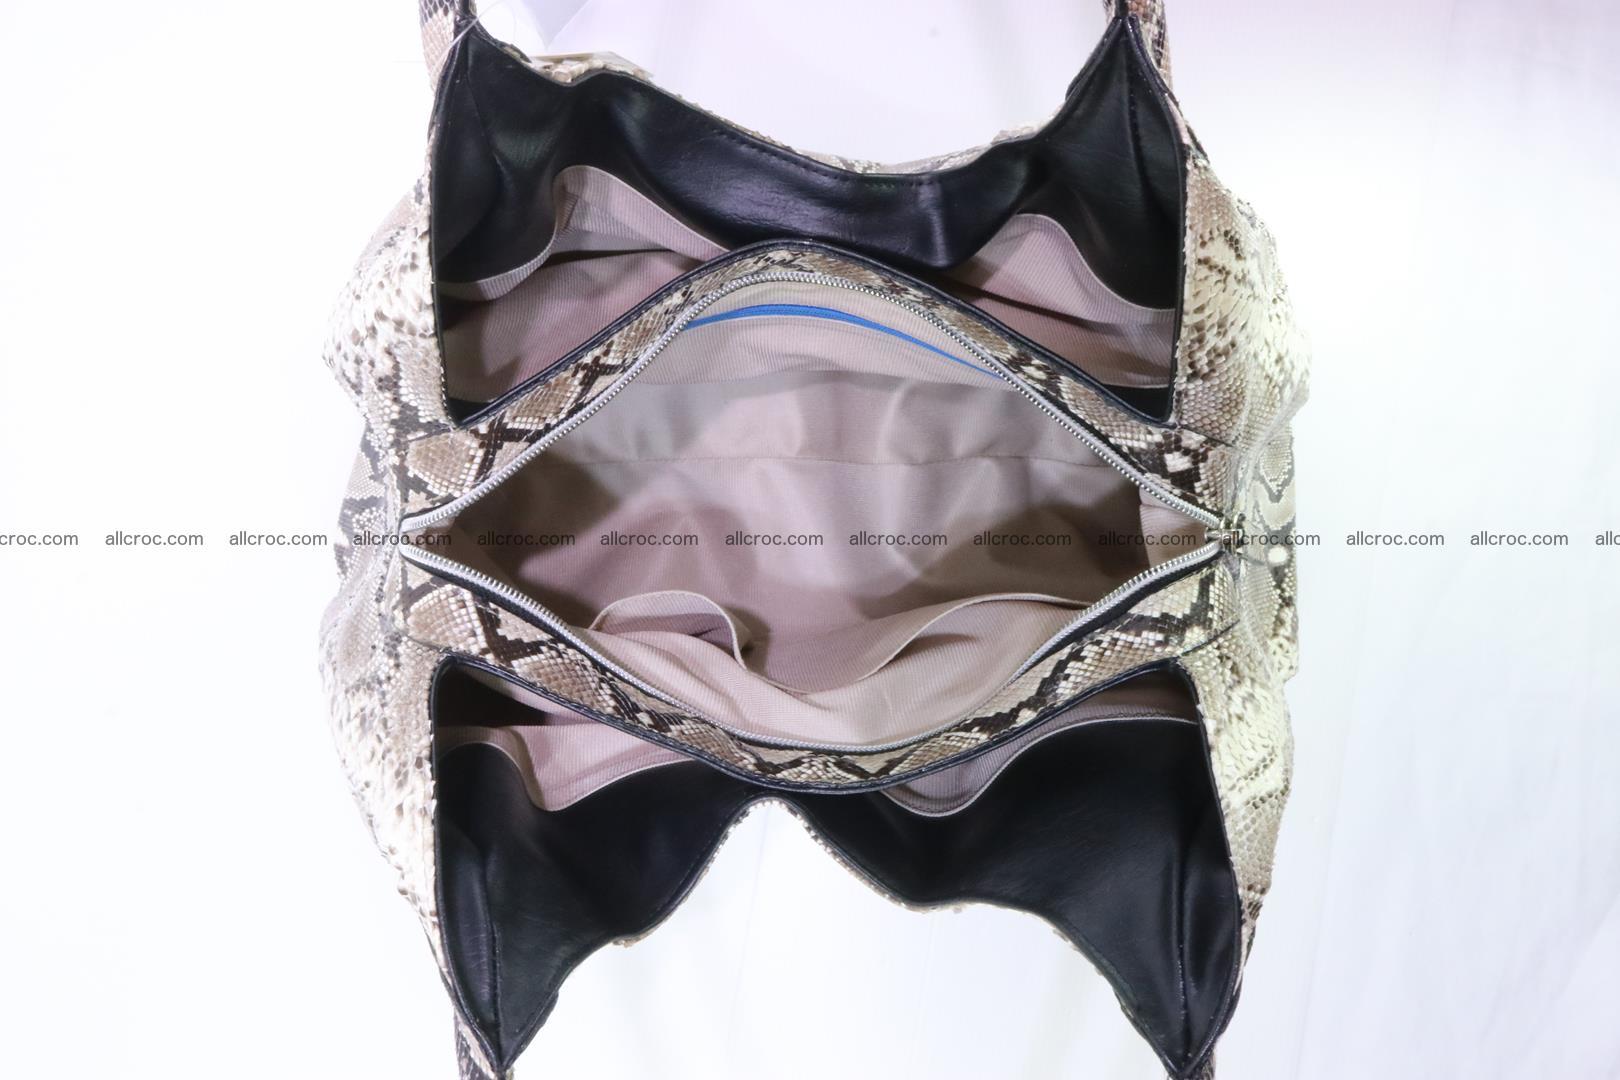 Python skin handbag for lady from genuine Python skin 197 Foto 9